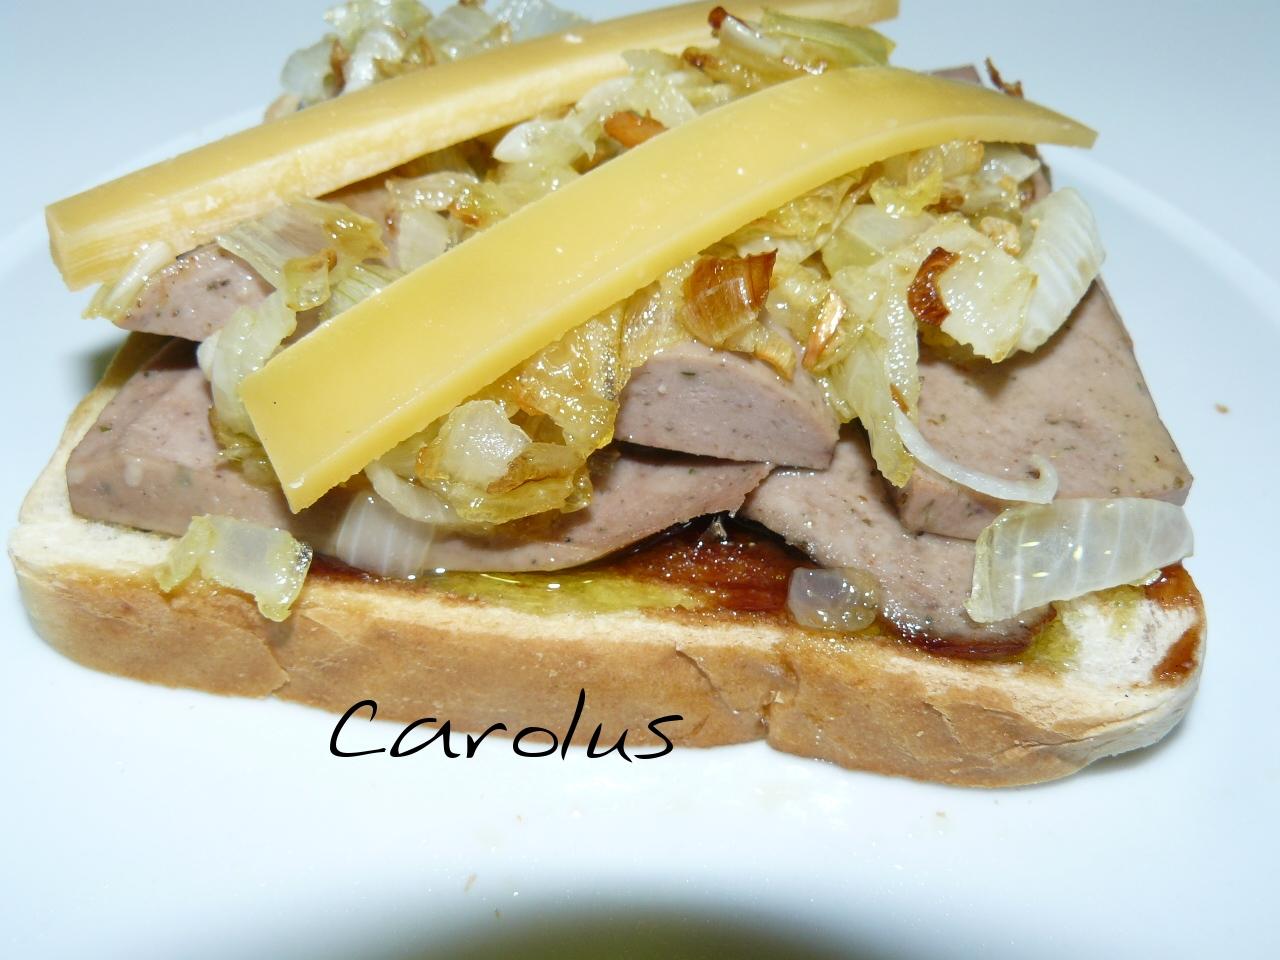 http://3.bp.blogspot.com/-p4KlS9P-Ldc/T_b_BWVttqI/AAAAAAAABOY/_k72ry-E2kA/s1600/tosta+bratswurt.JPG